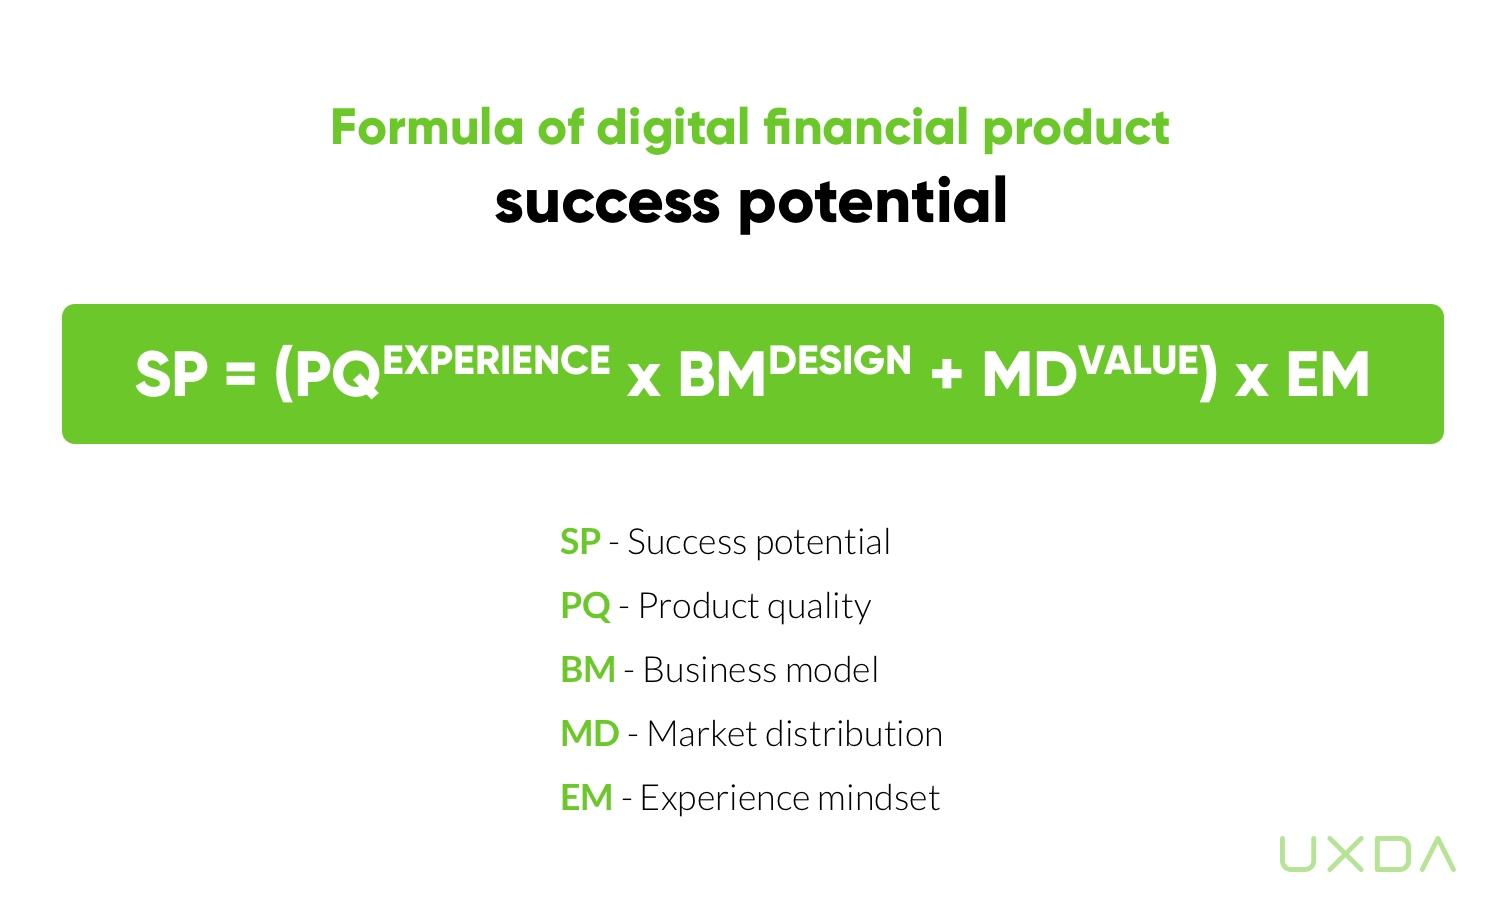 financial-ux-design-digital-product-5.jpg